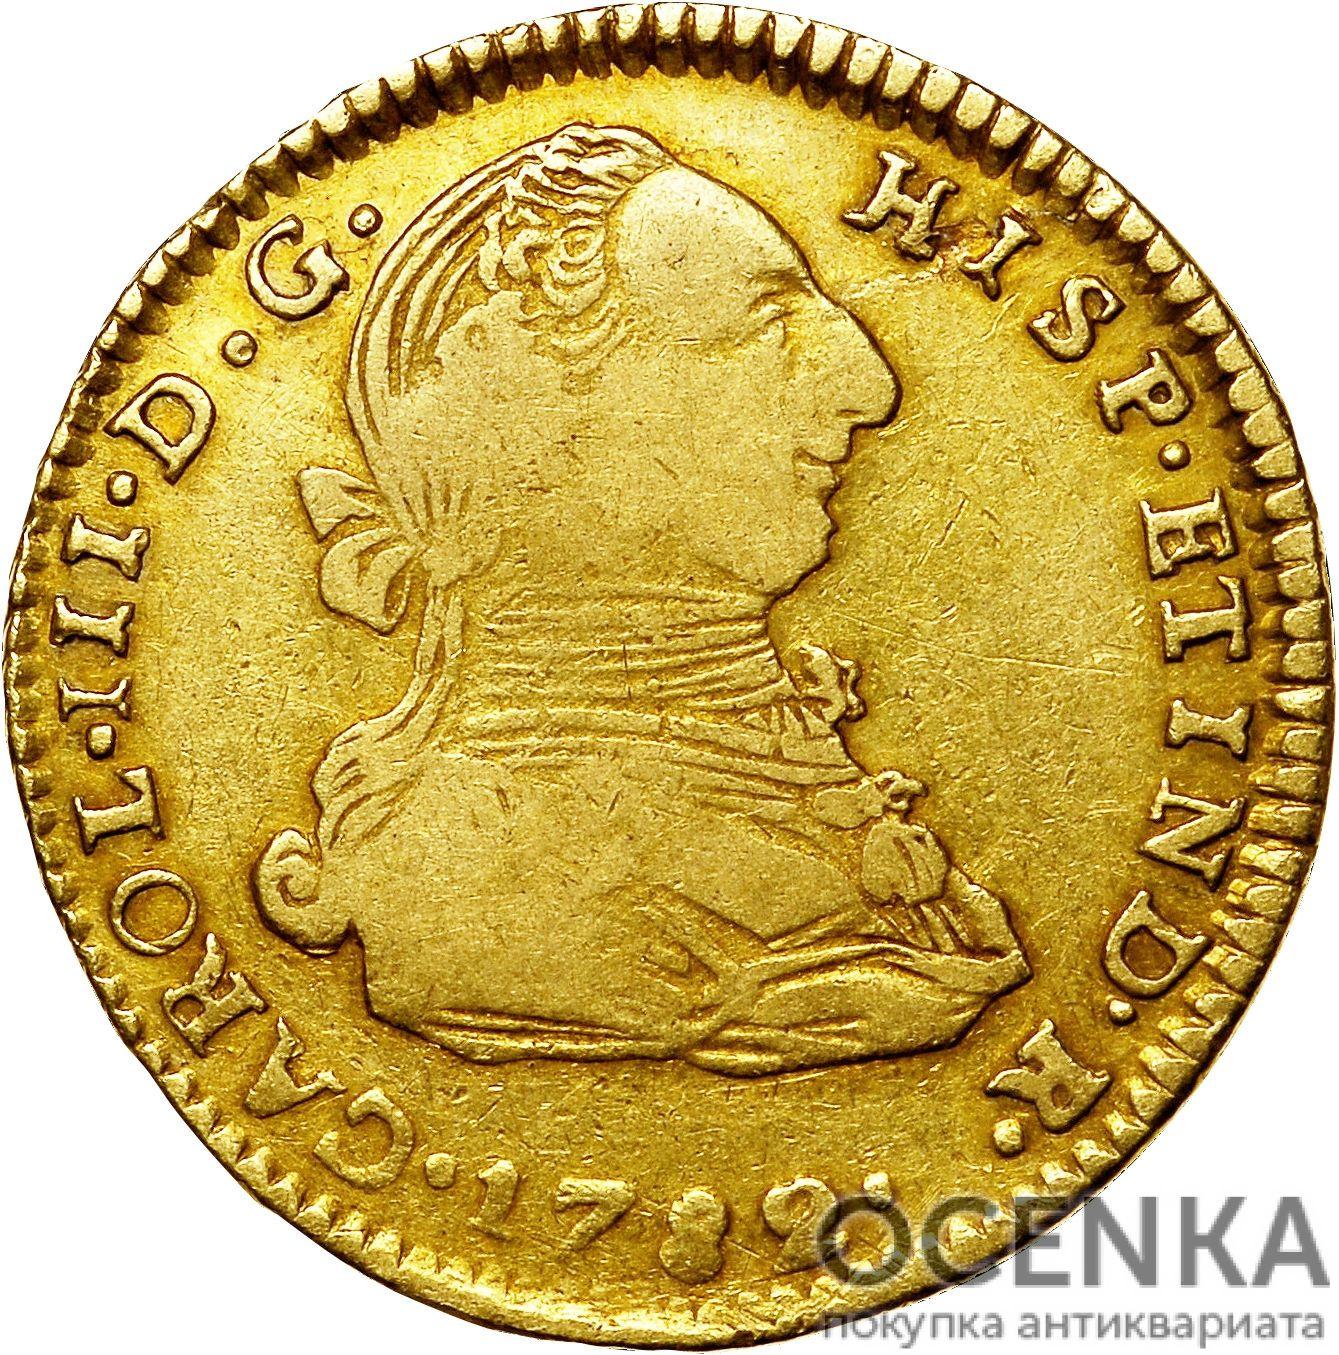 Золотая монета 2 эскудо (2 Escudos) Боливия - 1